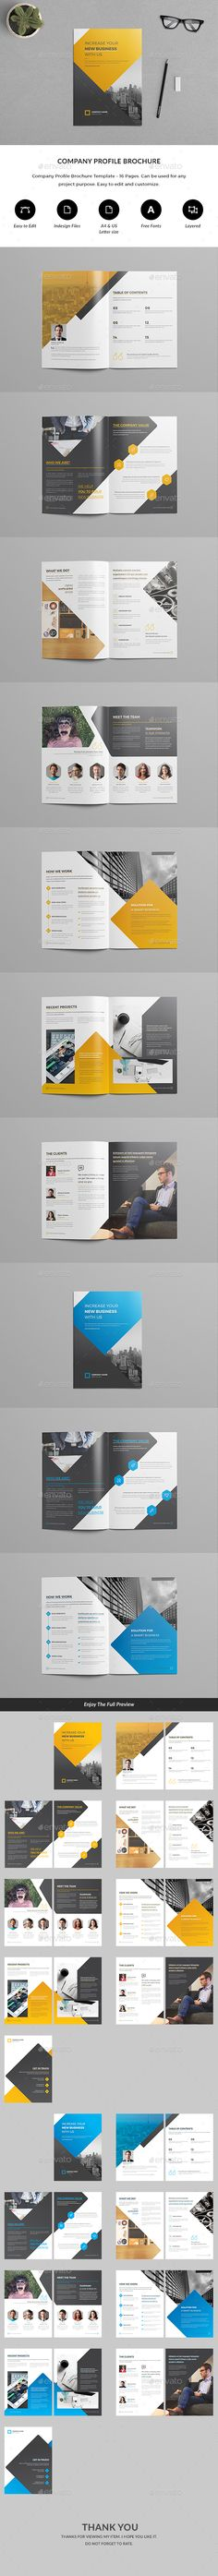 Daleman Company Profile Company profile, Indesign templates and - profile company template